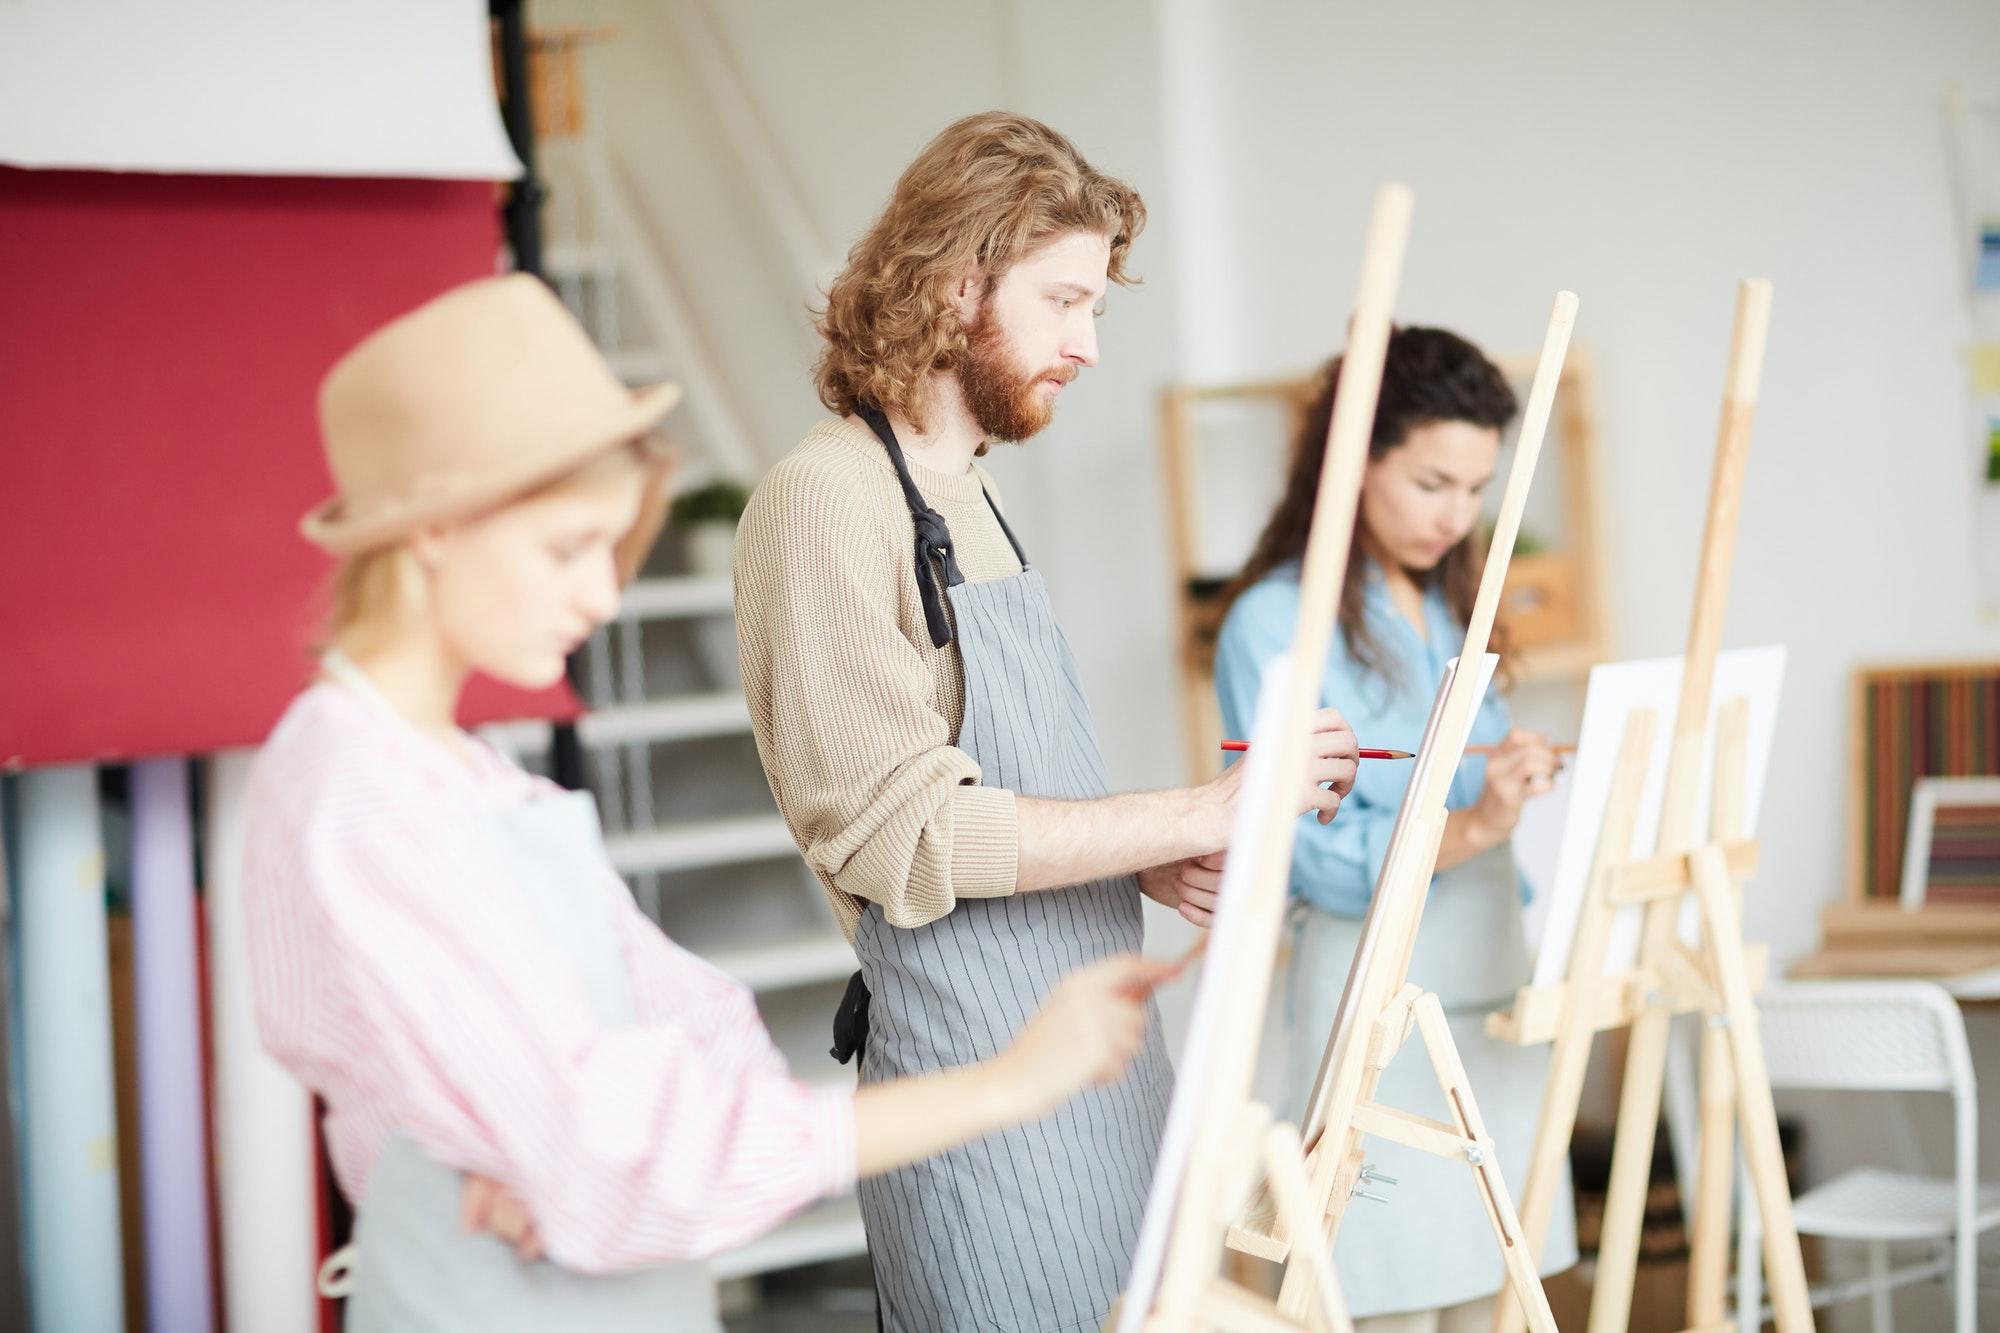 Painting in studio of arts